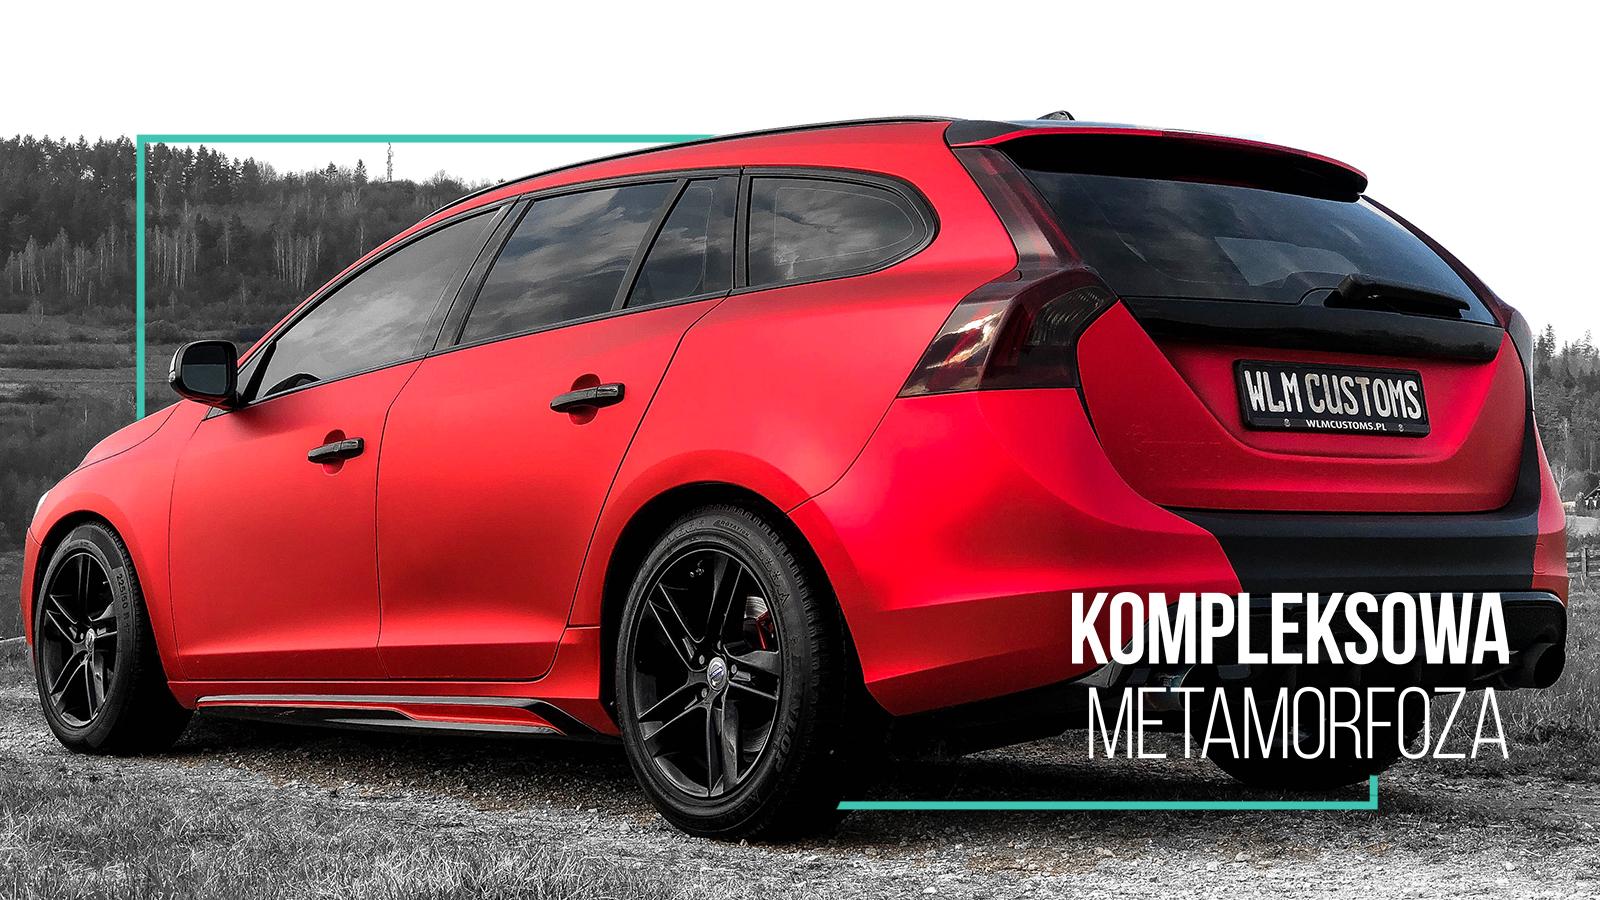 Volvo V60 R-Design - Kompleksowa metamorfoza